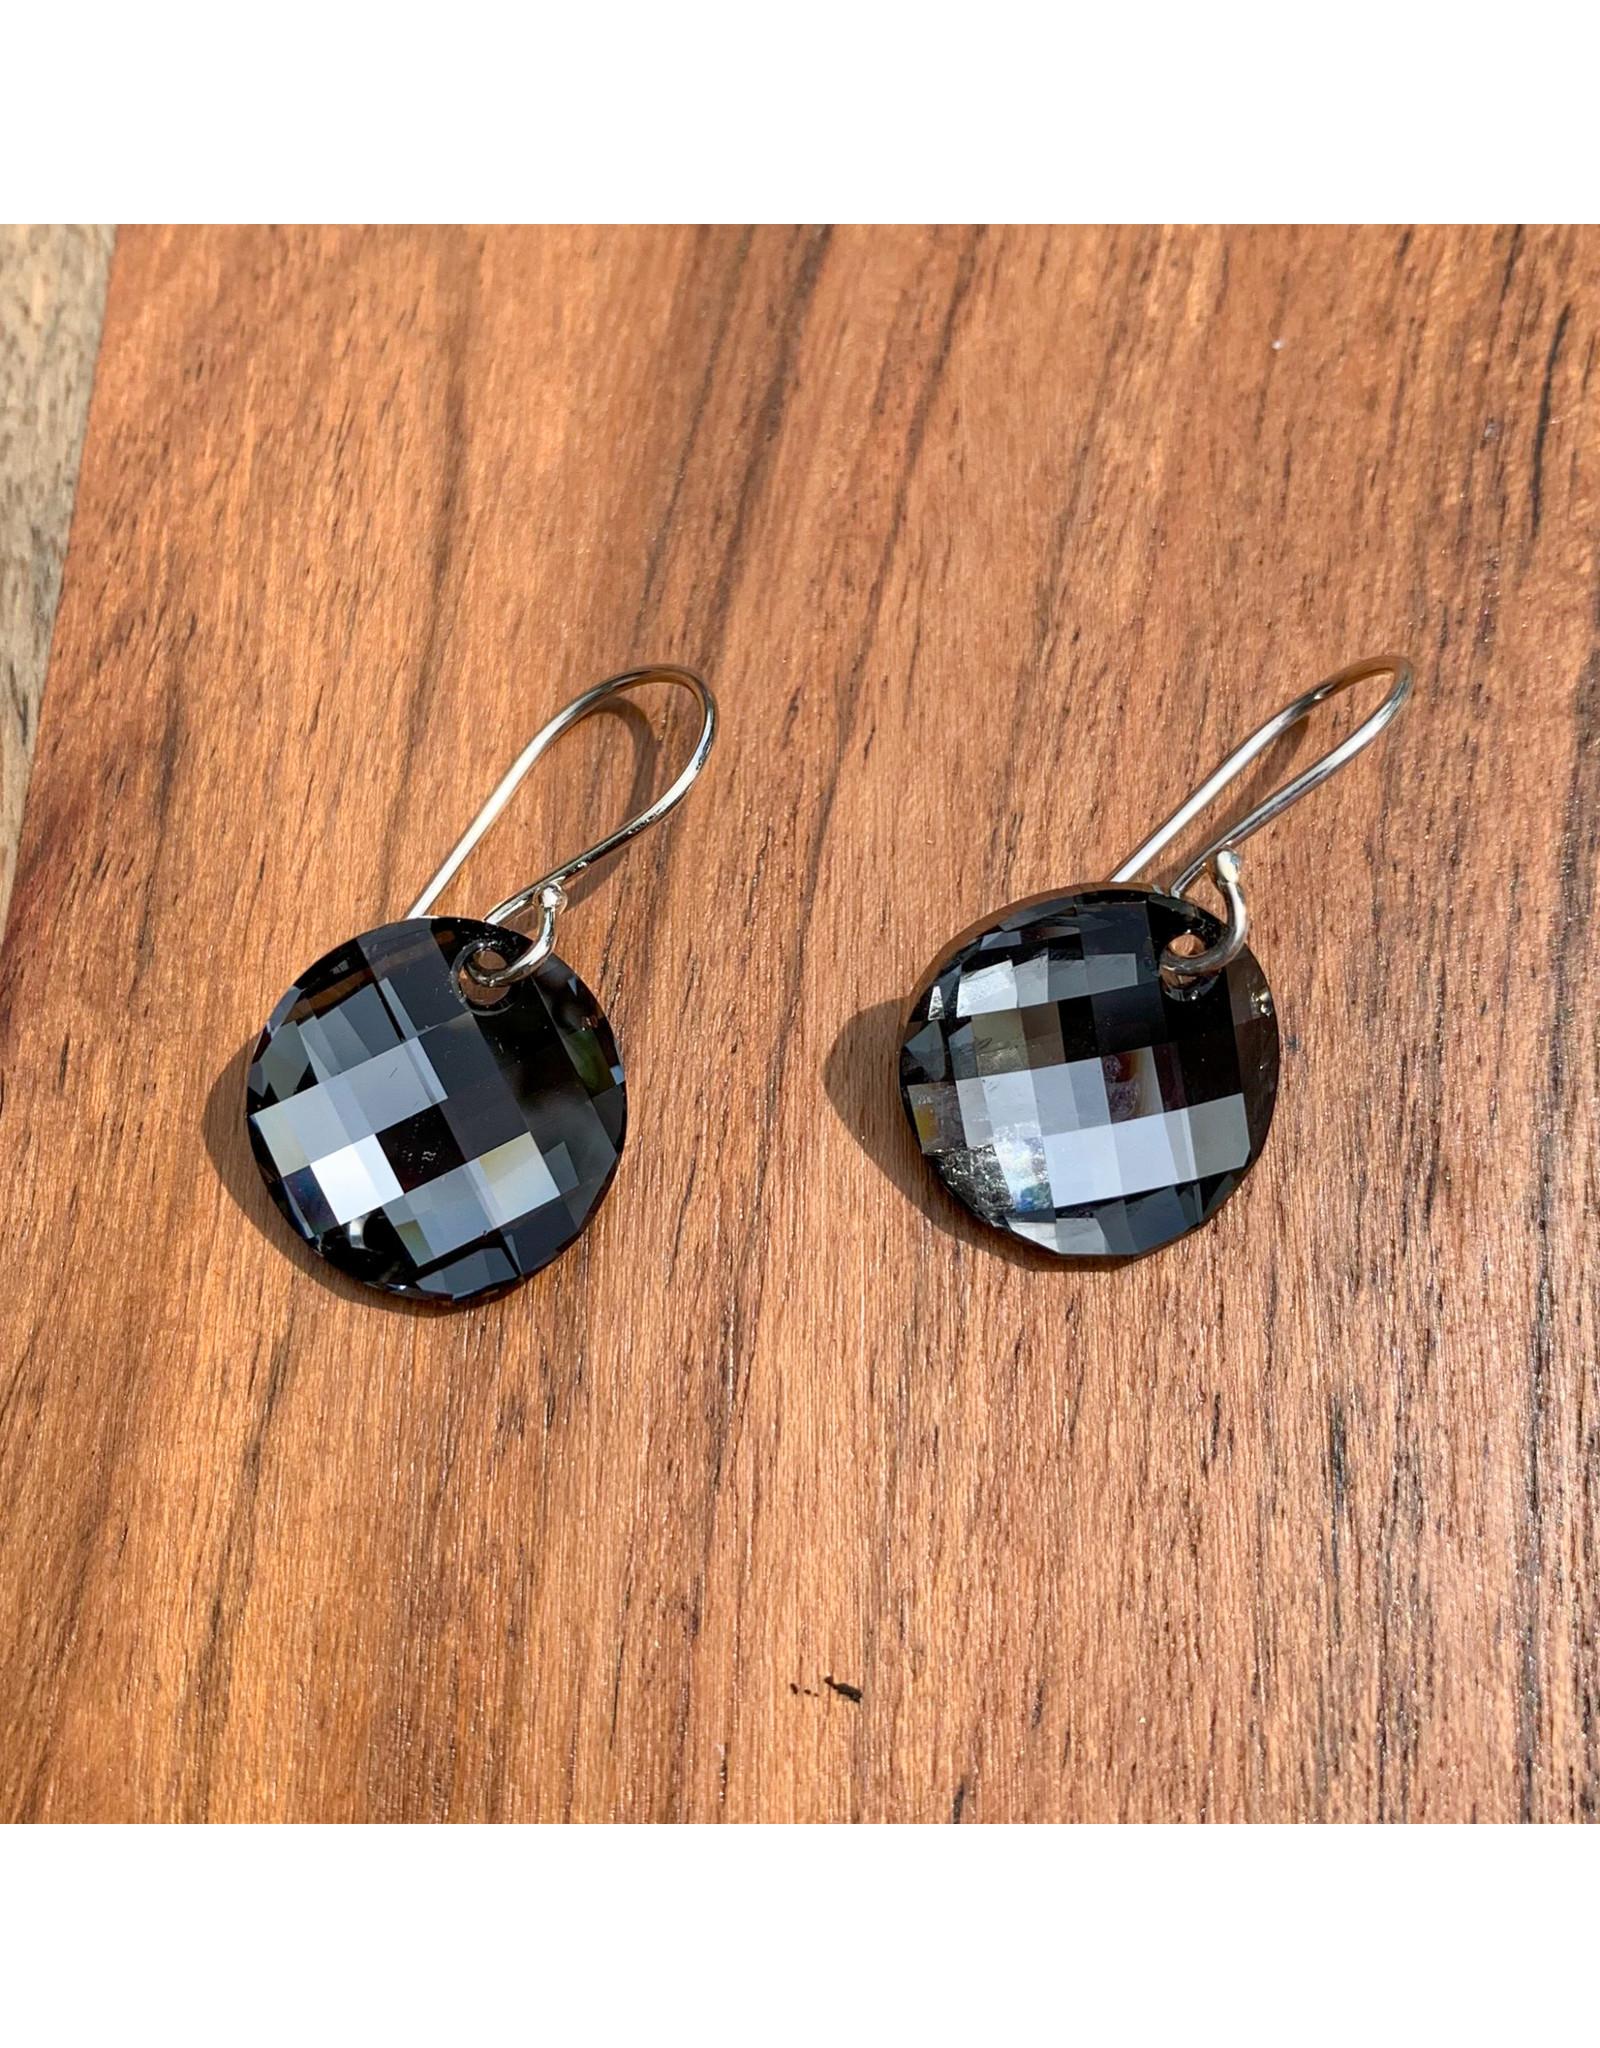 Diablo Organics Diablo Organics Black Diamond Twist Swarovski traditional earrings on silver coils